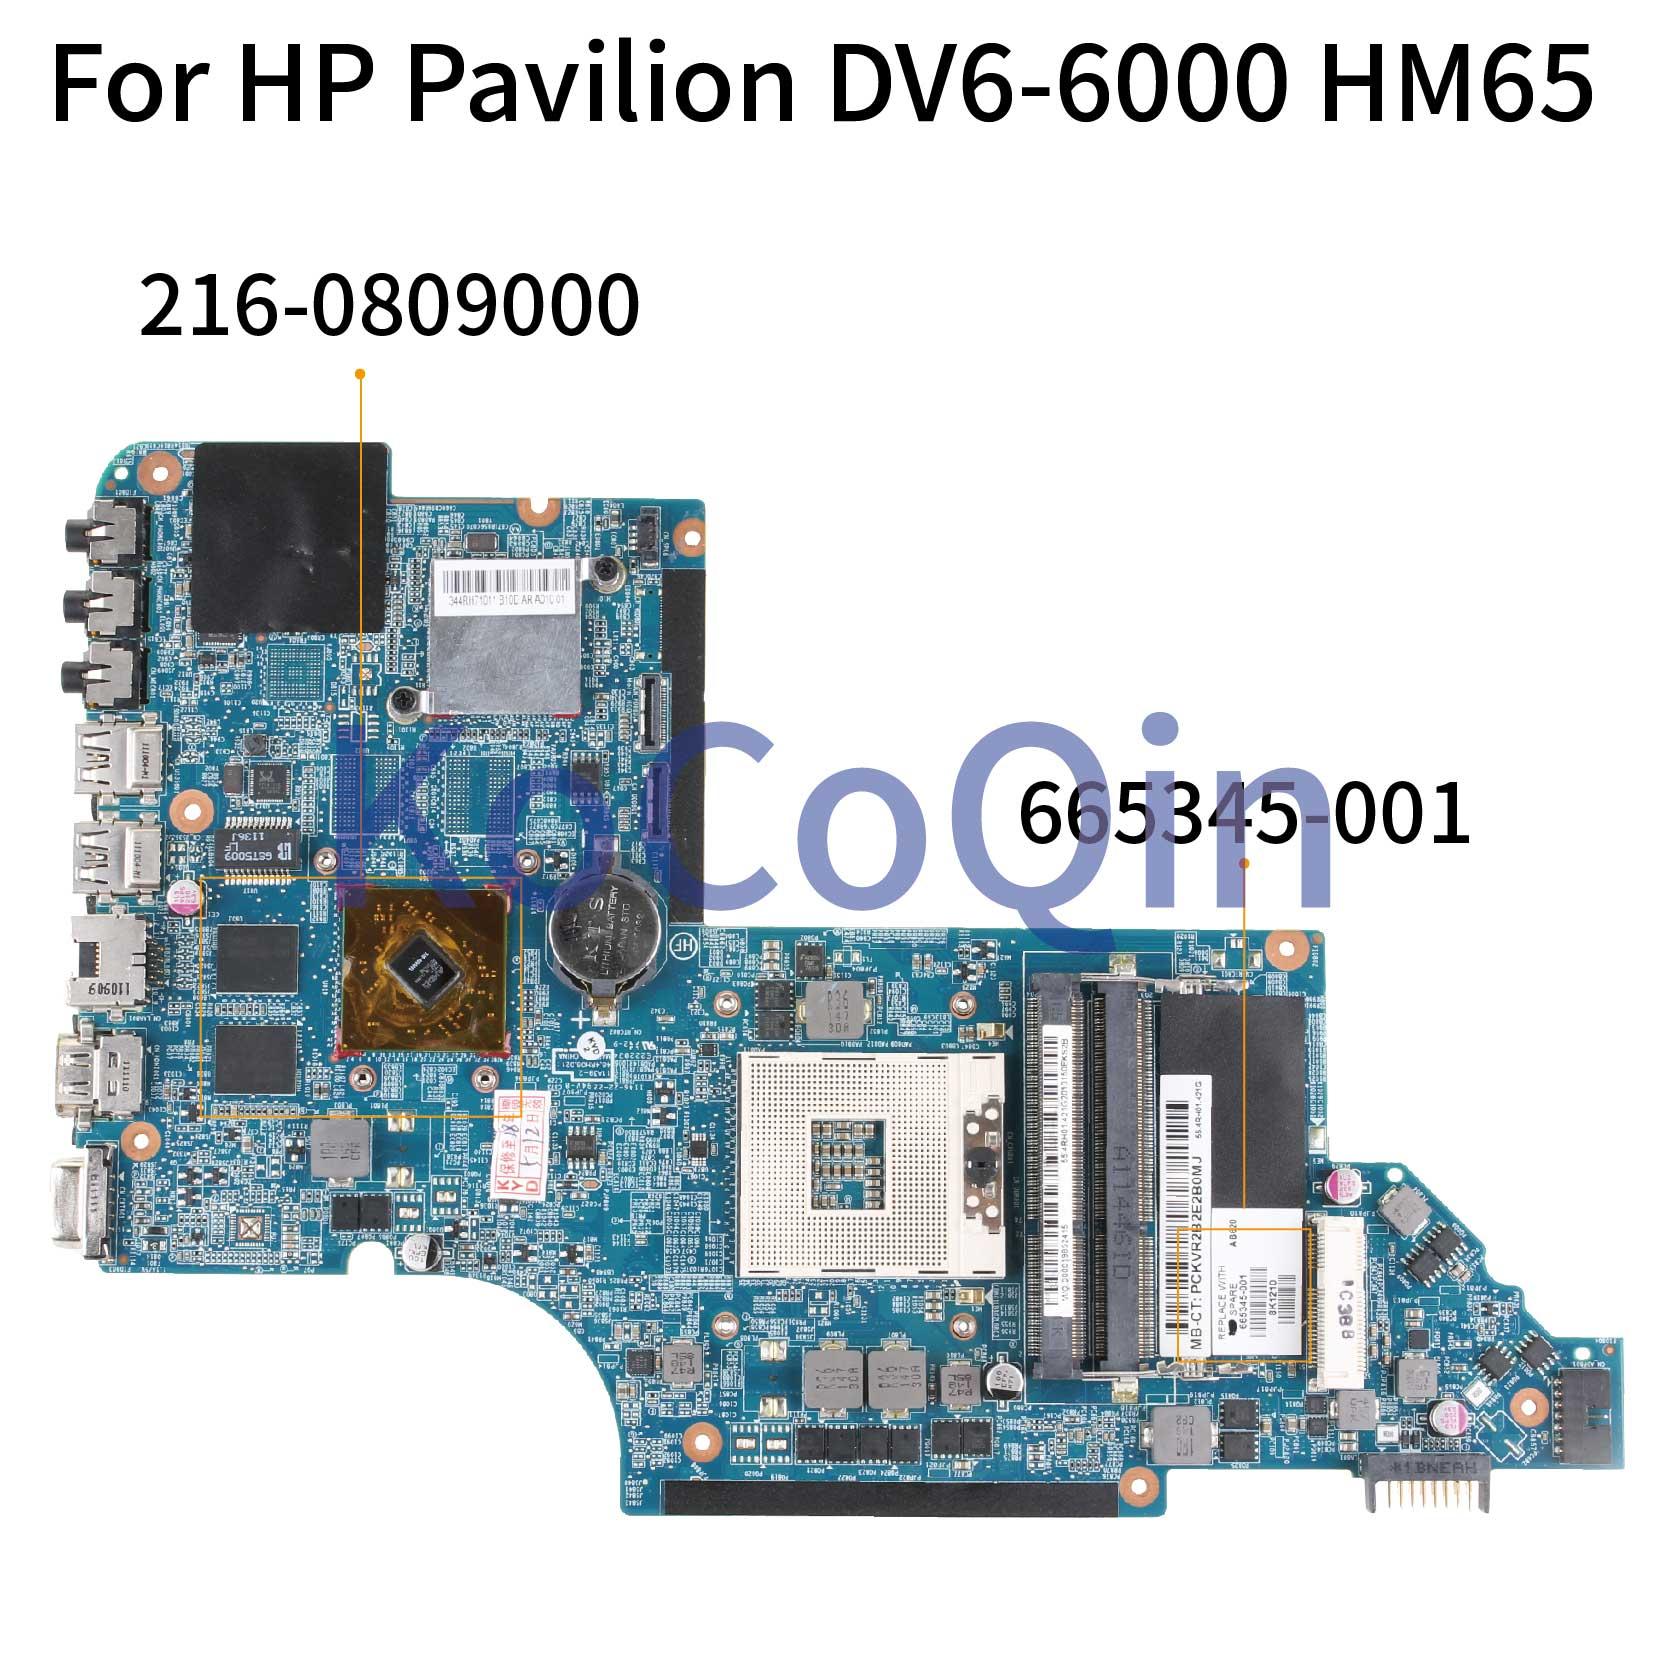 KoCoQin اللوحة لابتوب HP جناح DV6 DV6-6000 DV6T-6000 665345-001 665345-501 216-0809000 HM65 اللوحة